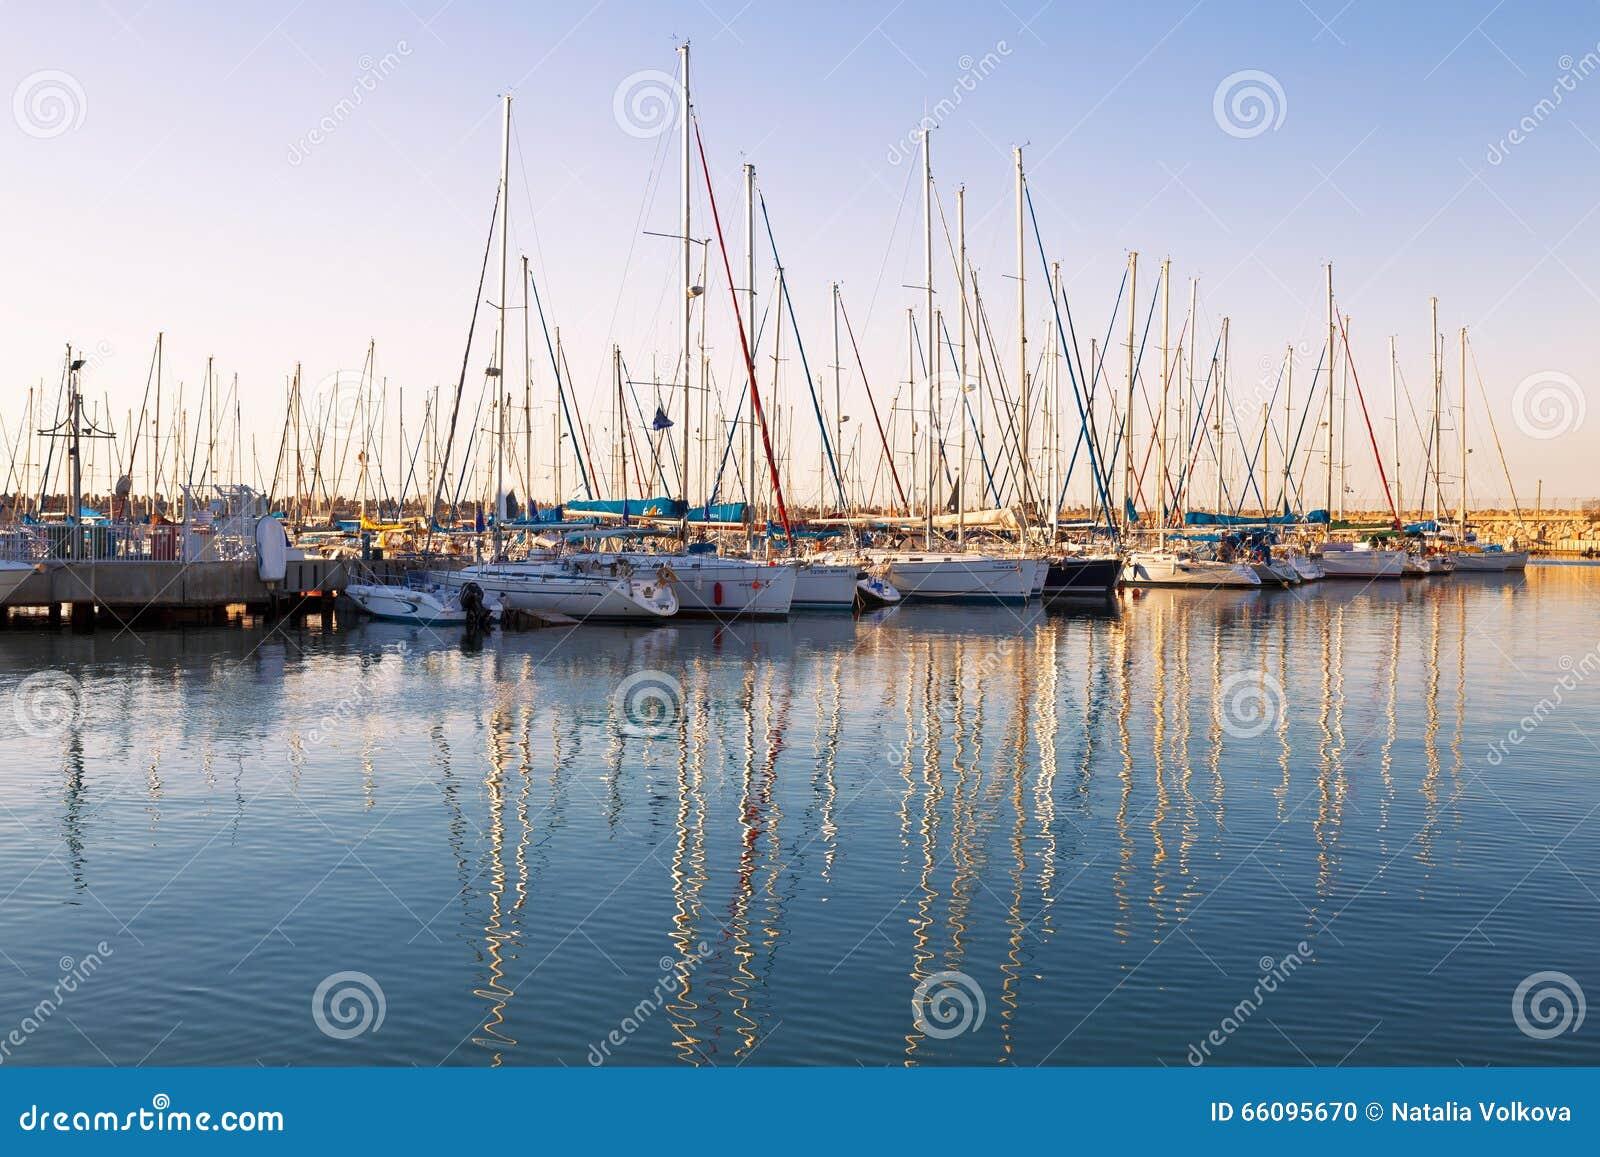 Marina with docked yachts at sunset